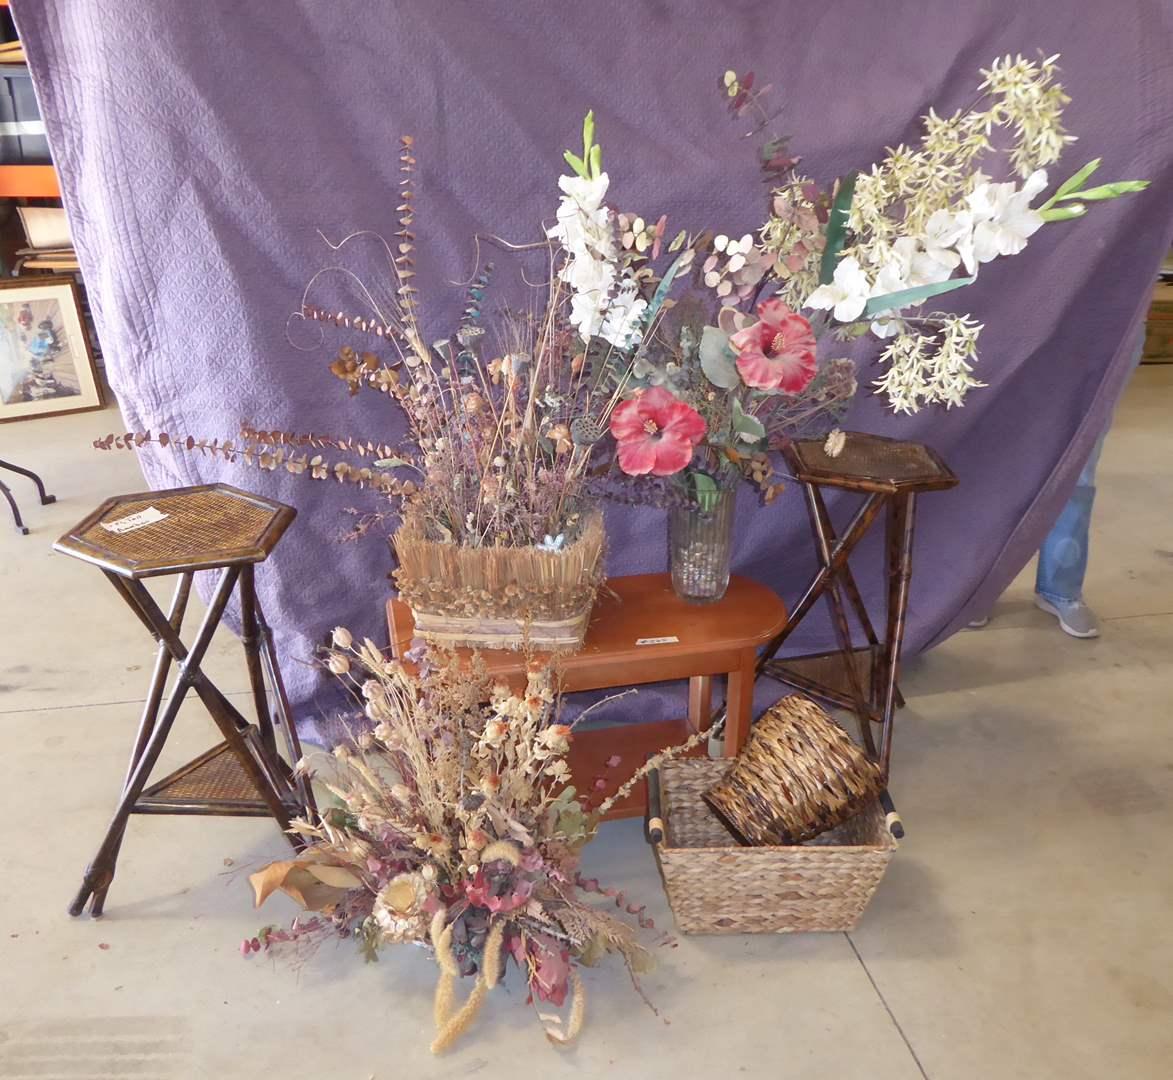 Lot # 265 - Two Matching Side Tables & Faux Floral Arrangements  (main image)